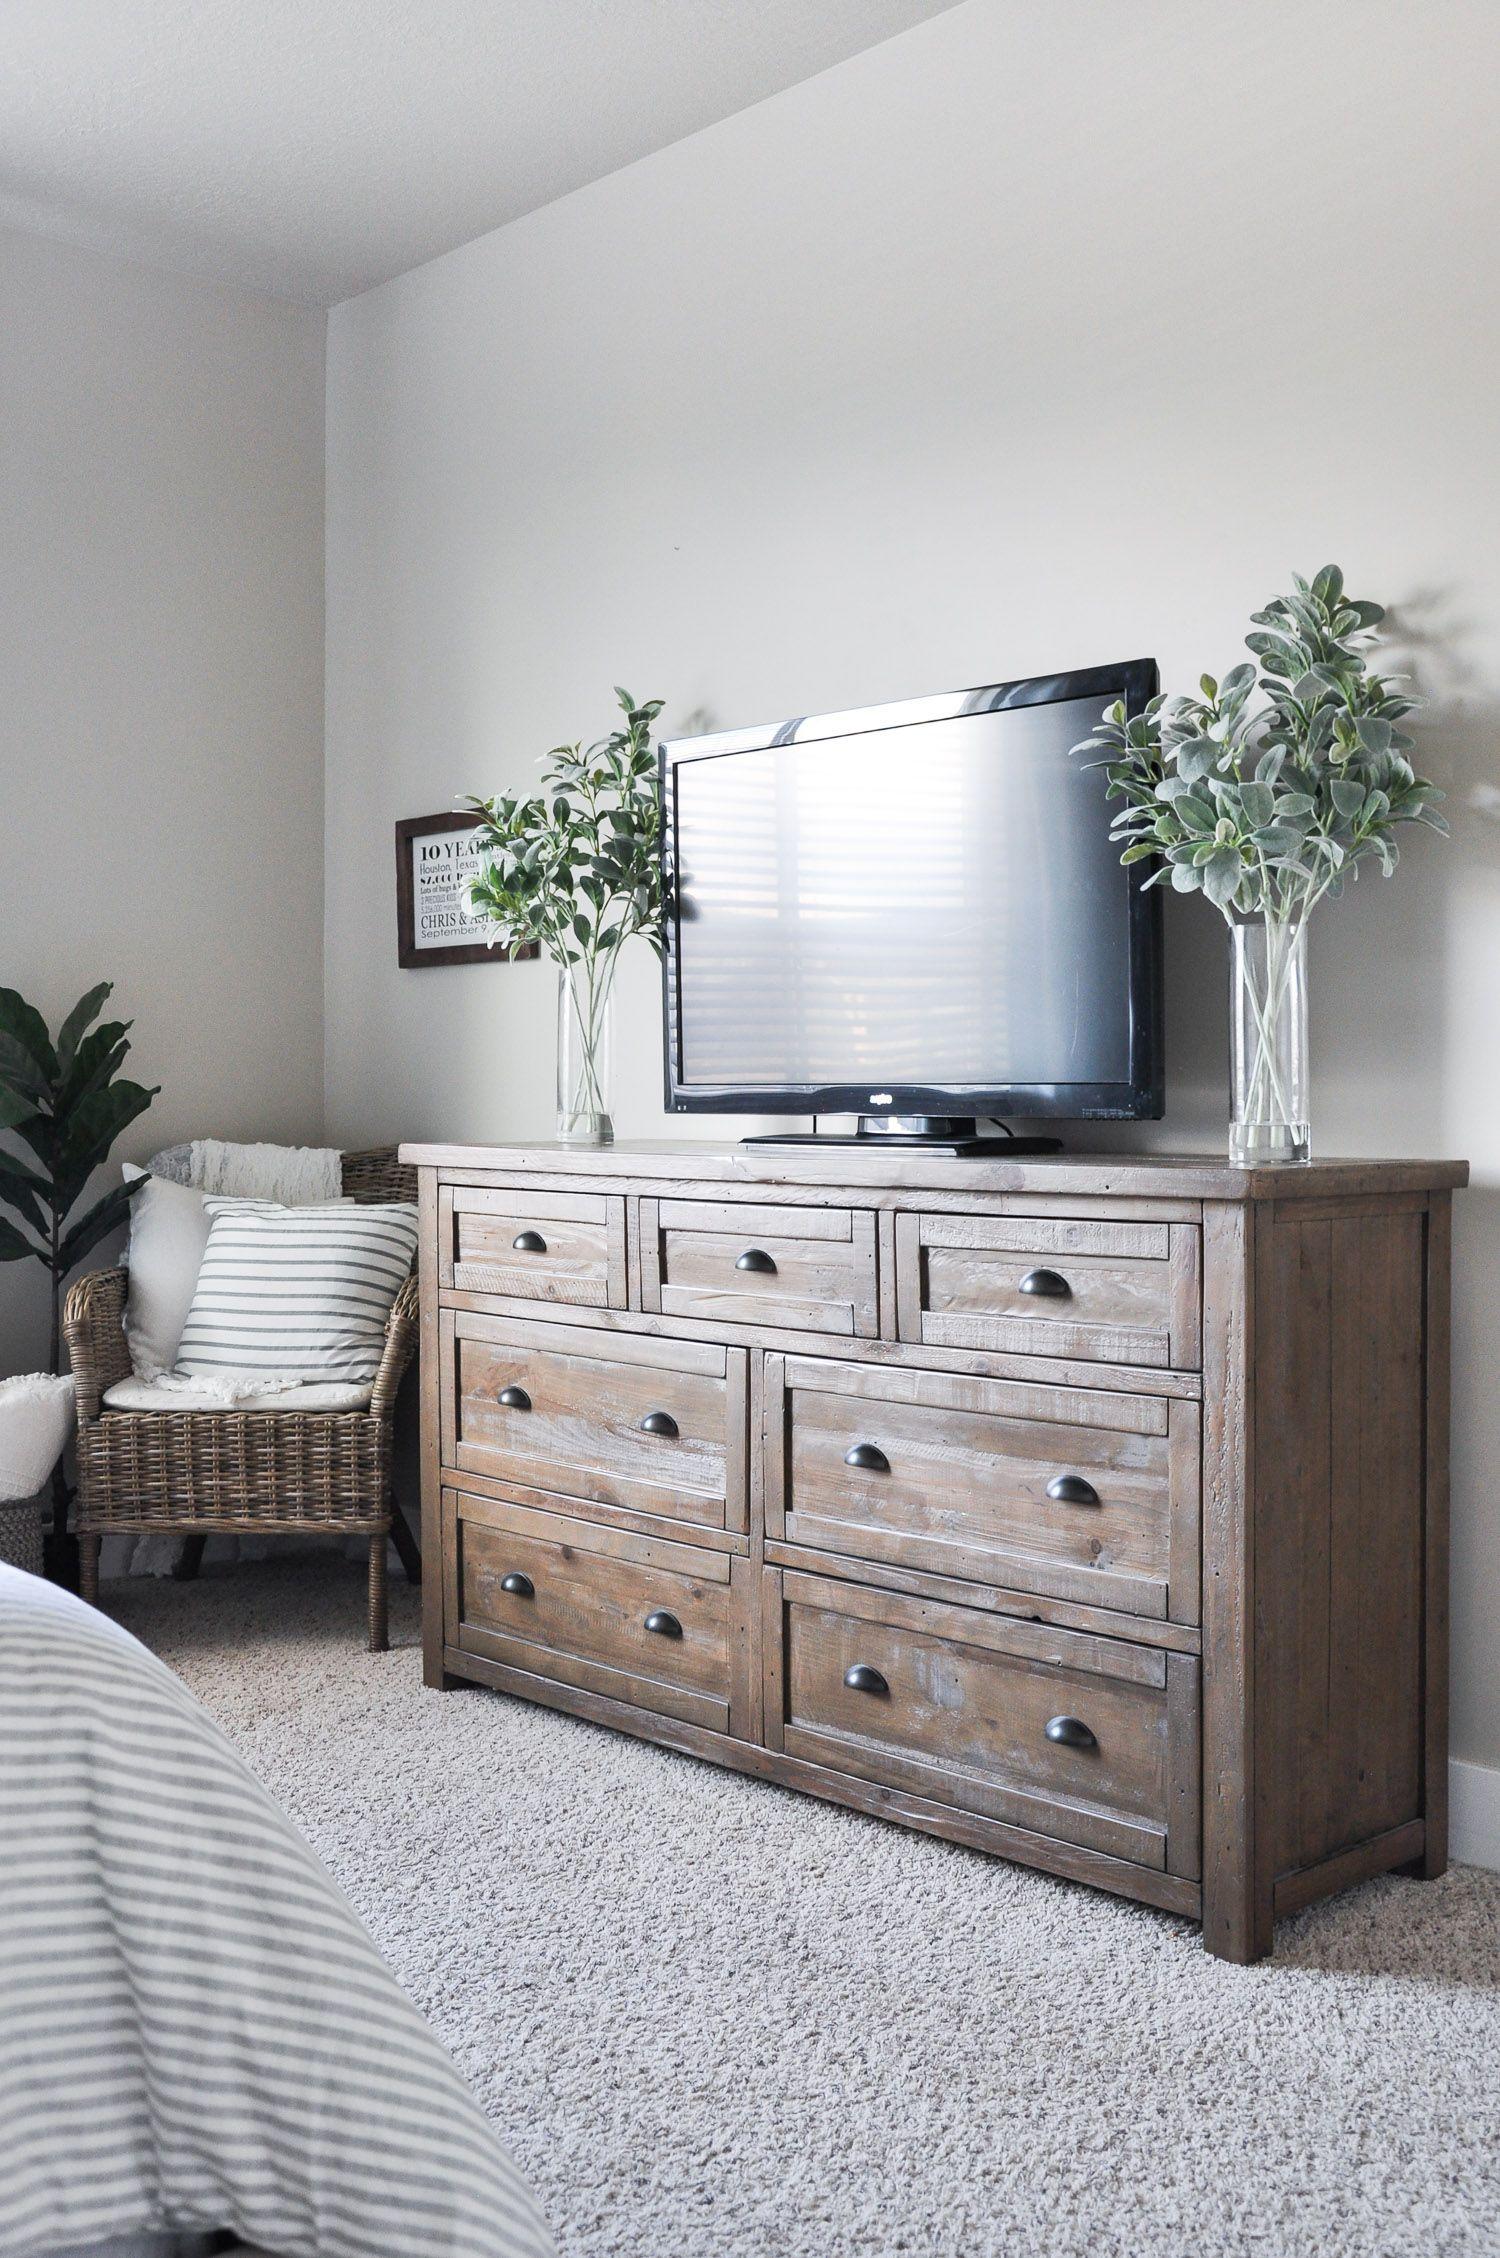 Modern Farmhouse Master Bedroom – Cherished Bliss